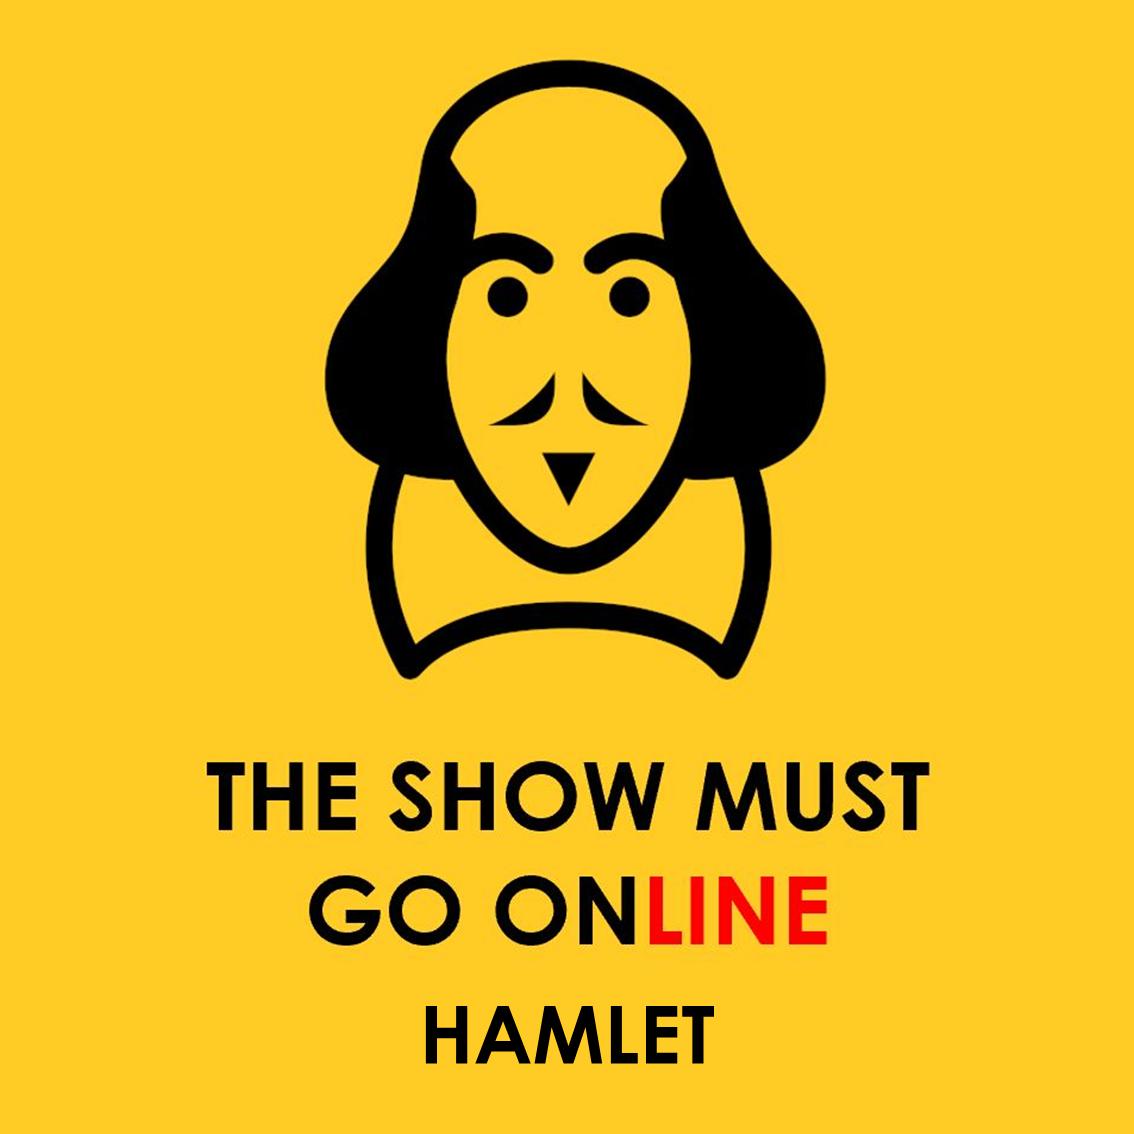 The Show Must Go Online – Hamlet Thumbnail